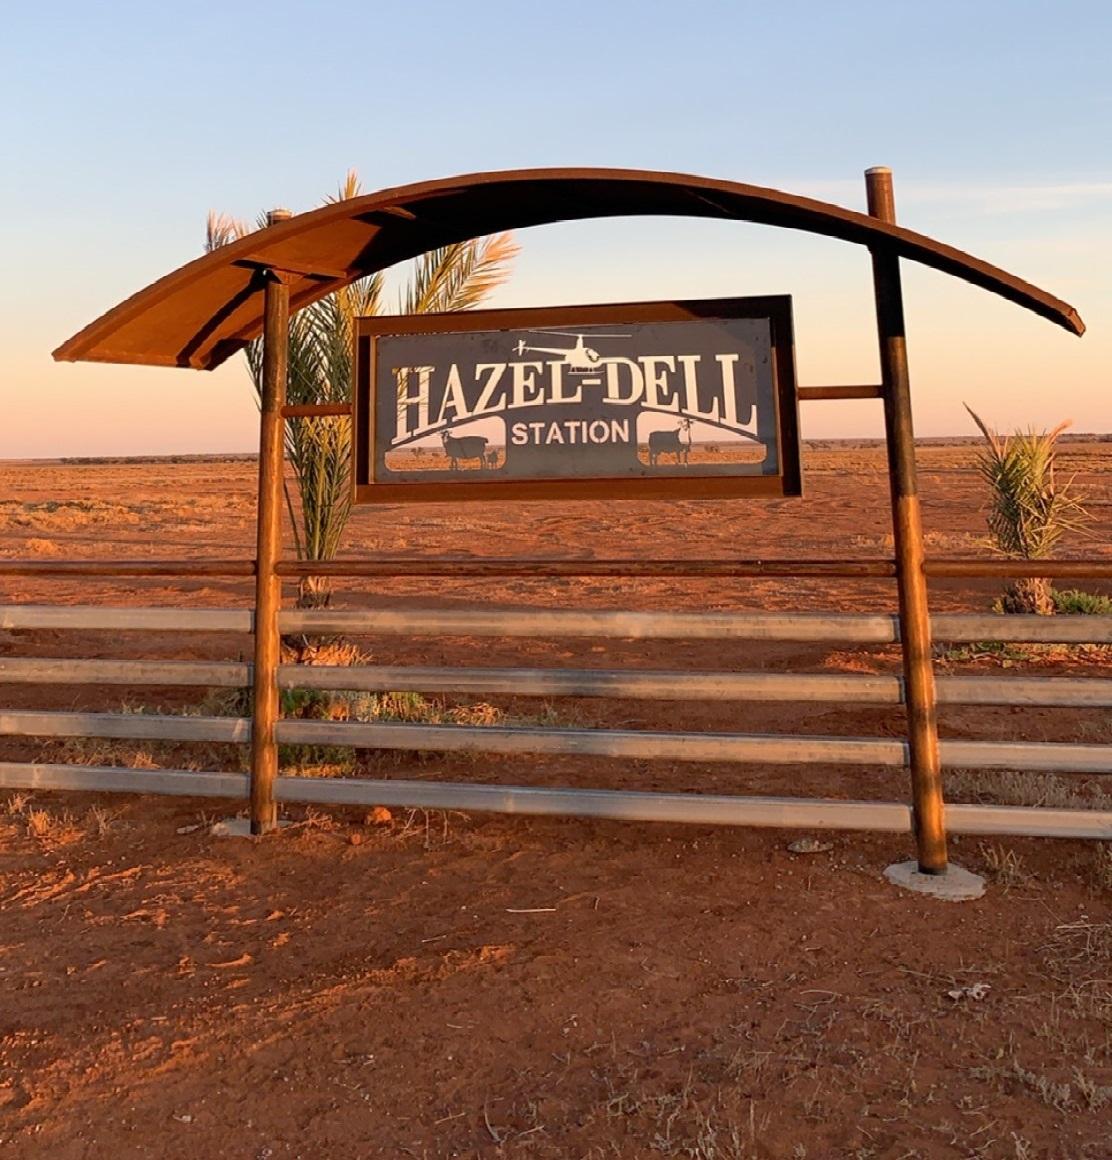 Hazel Del Station